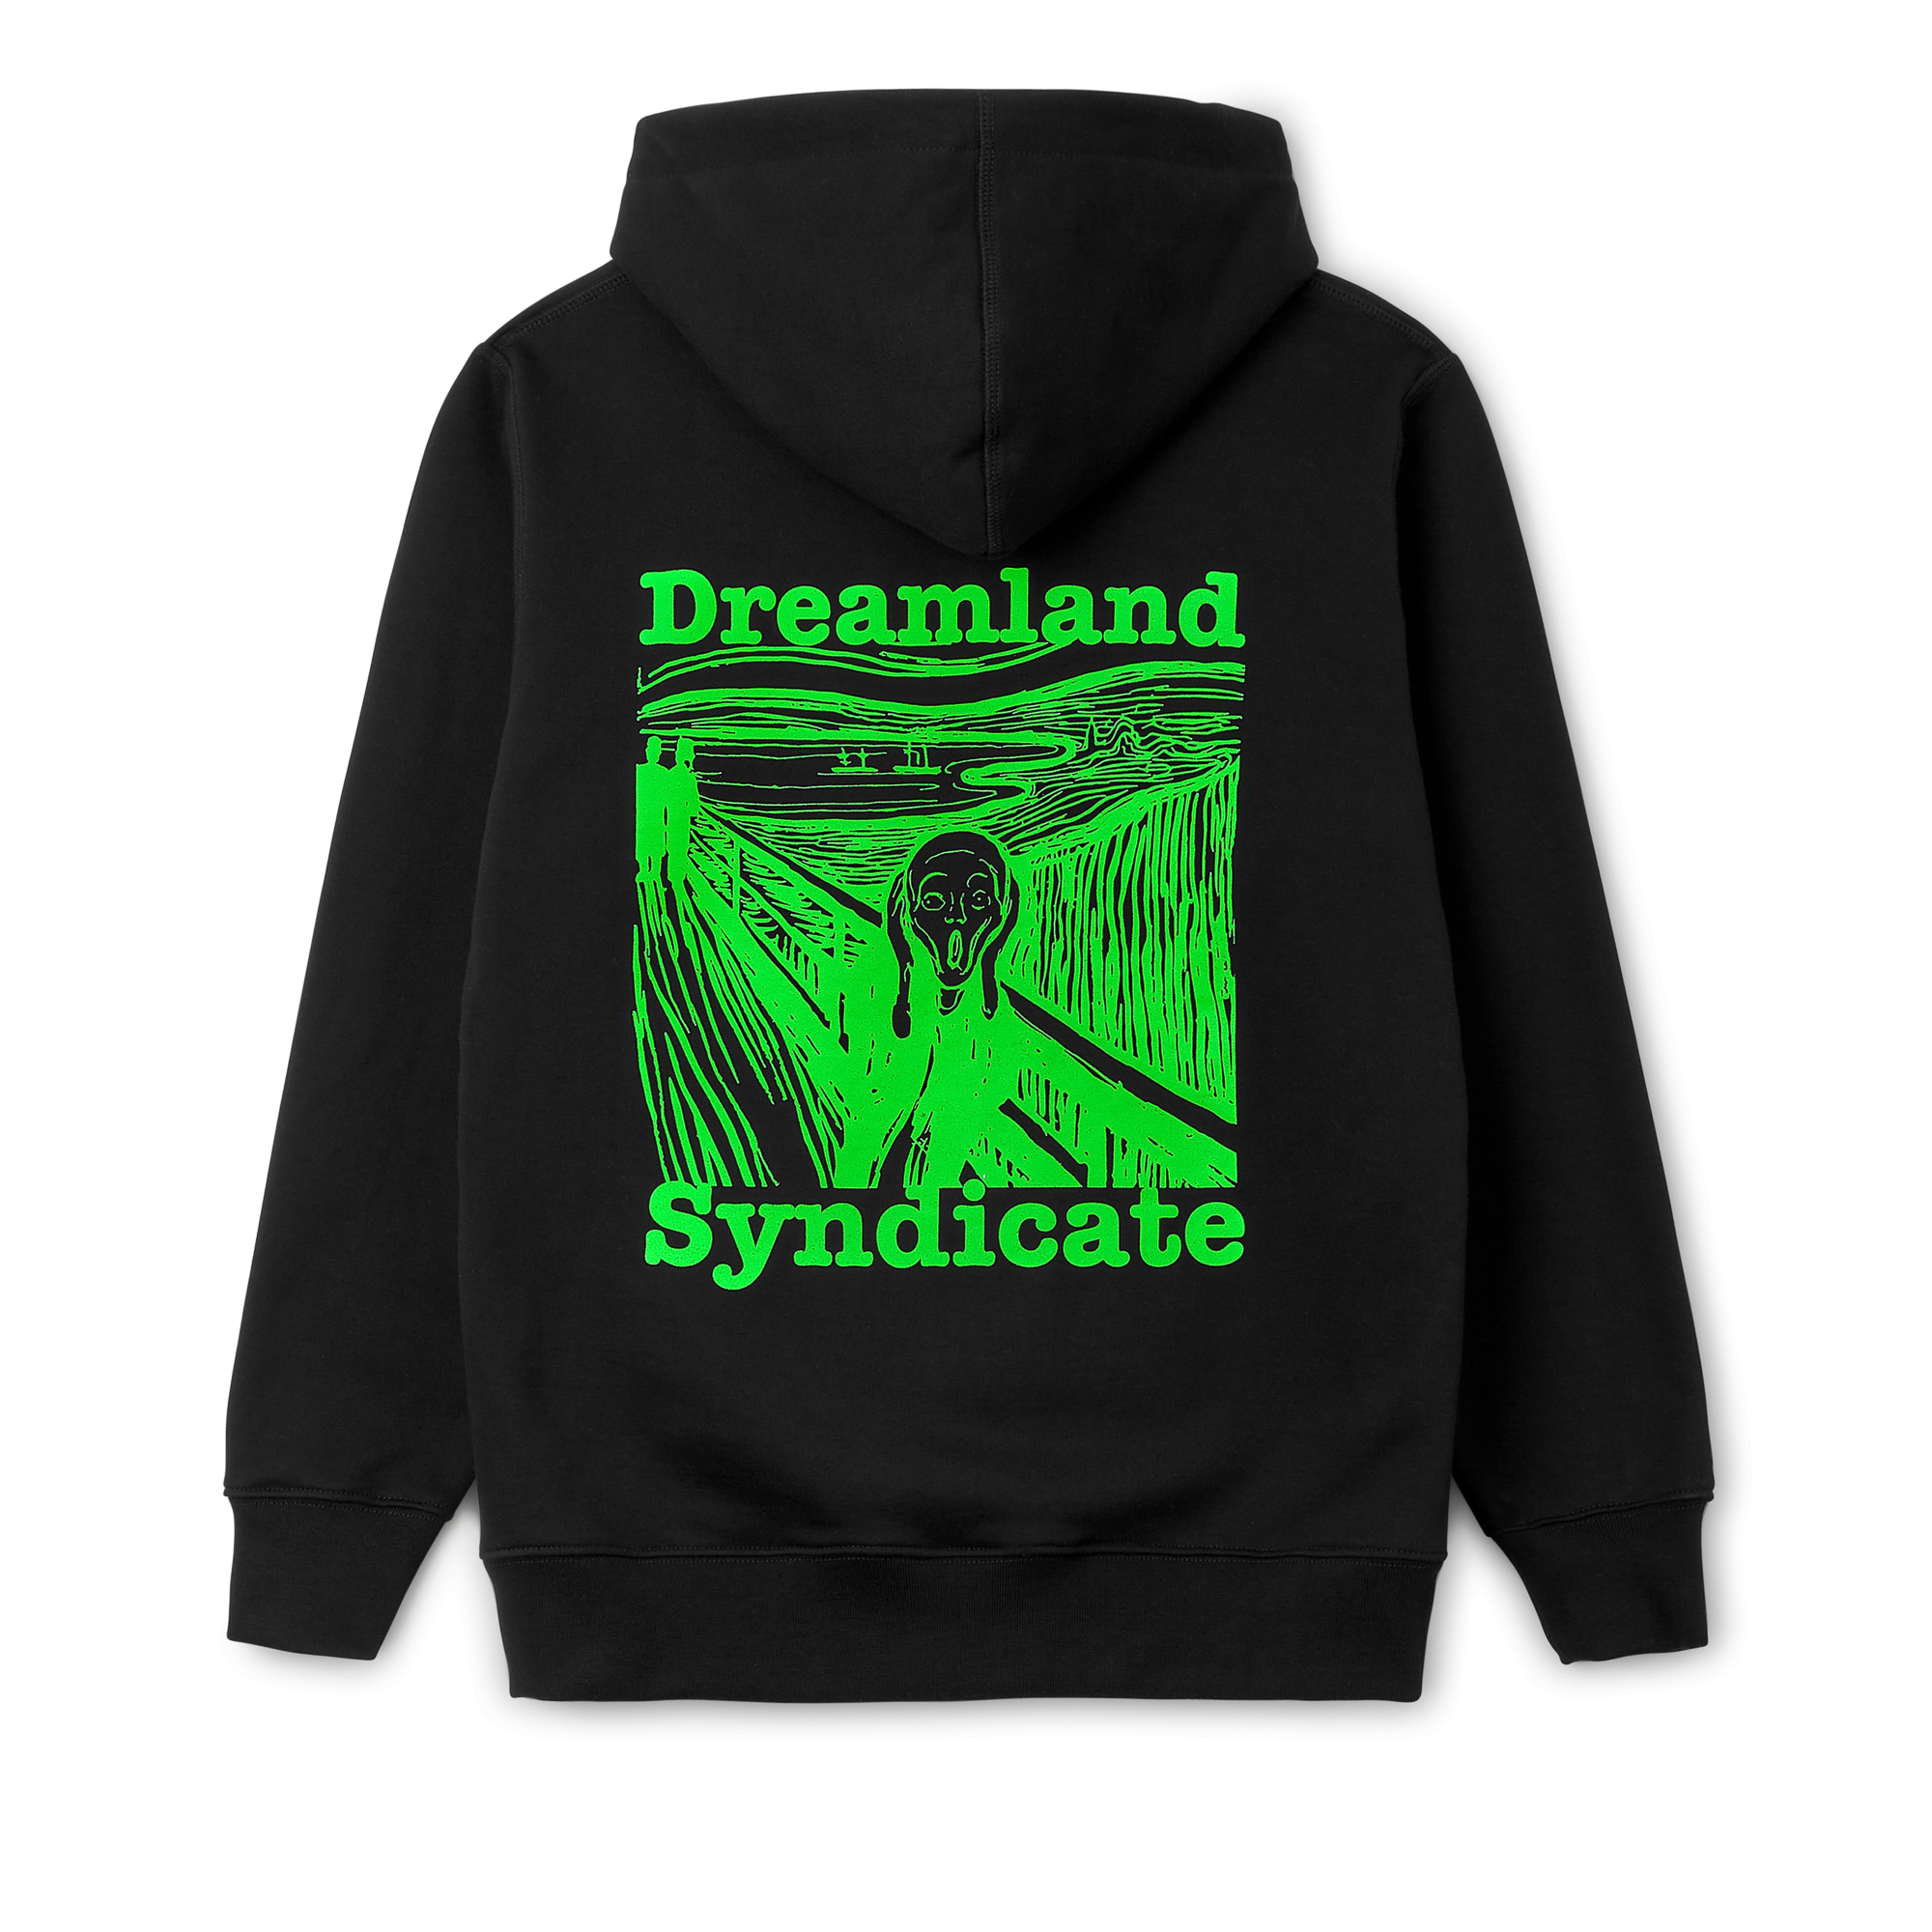 DREAMLAND SYNDICATE - shot 8